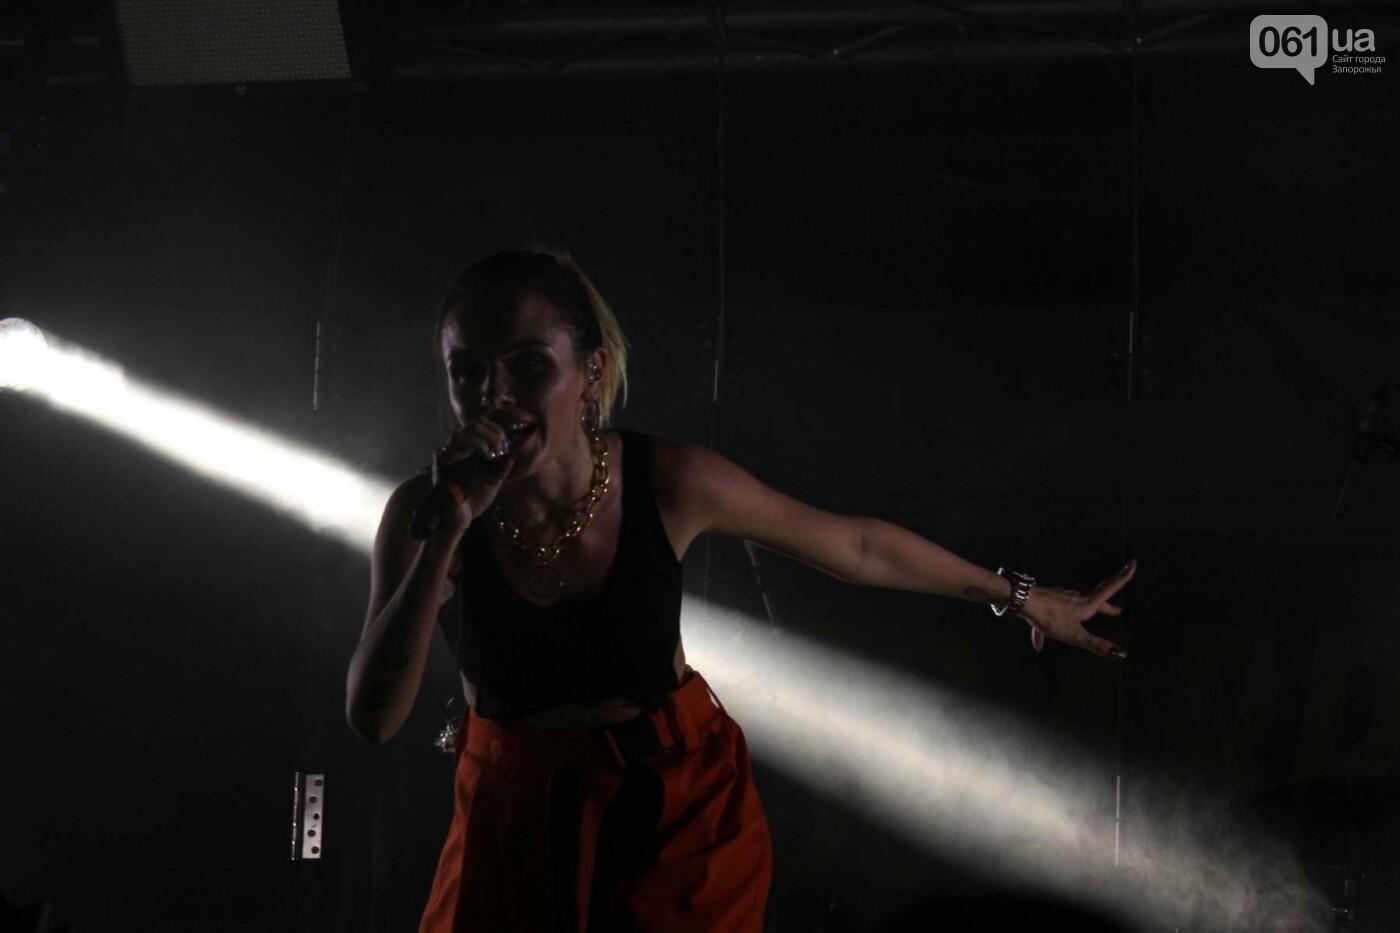 ALEKSEEV, «Агонь» и MamaRika: в Запорожье звезды устроили яркий концерт на «Miss AVRORA Summer 2018», – ФОТОРЕПОРТАЖ, фото-2